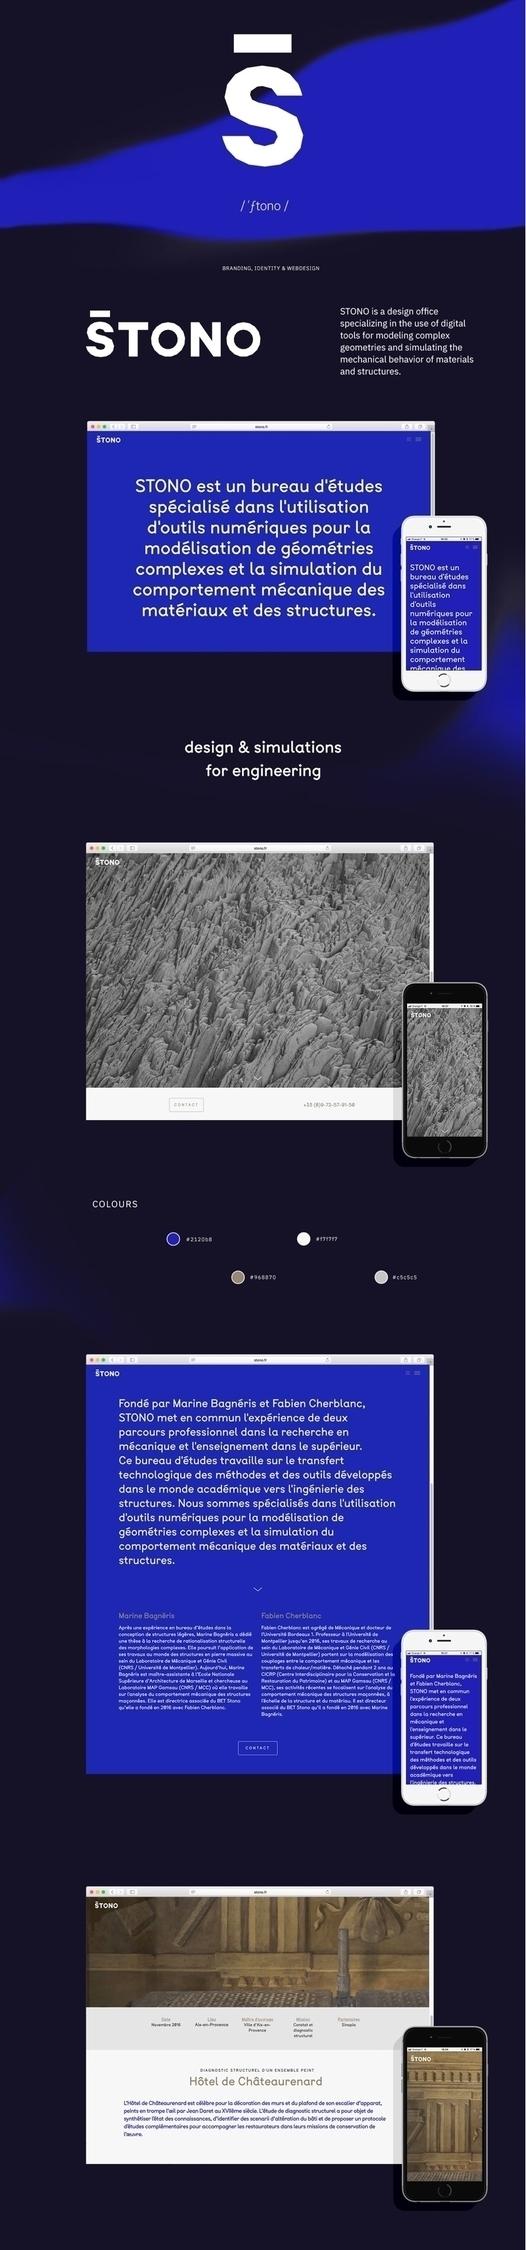 identity webdesign - davidbenmussa | ello